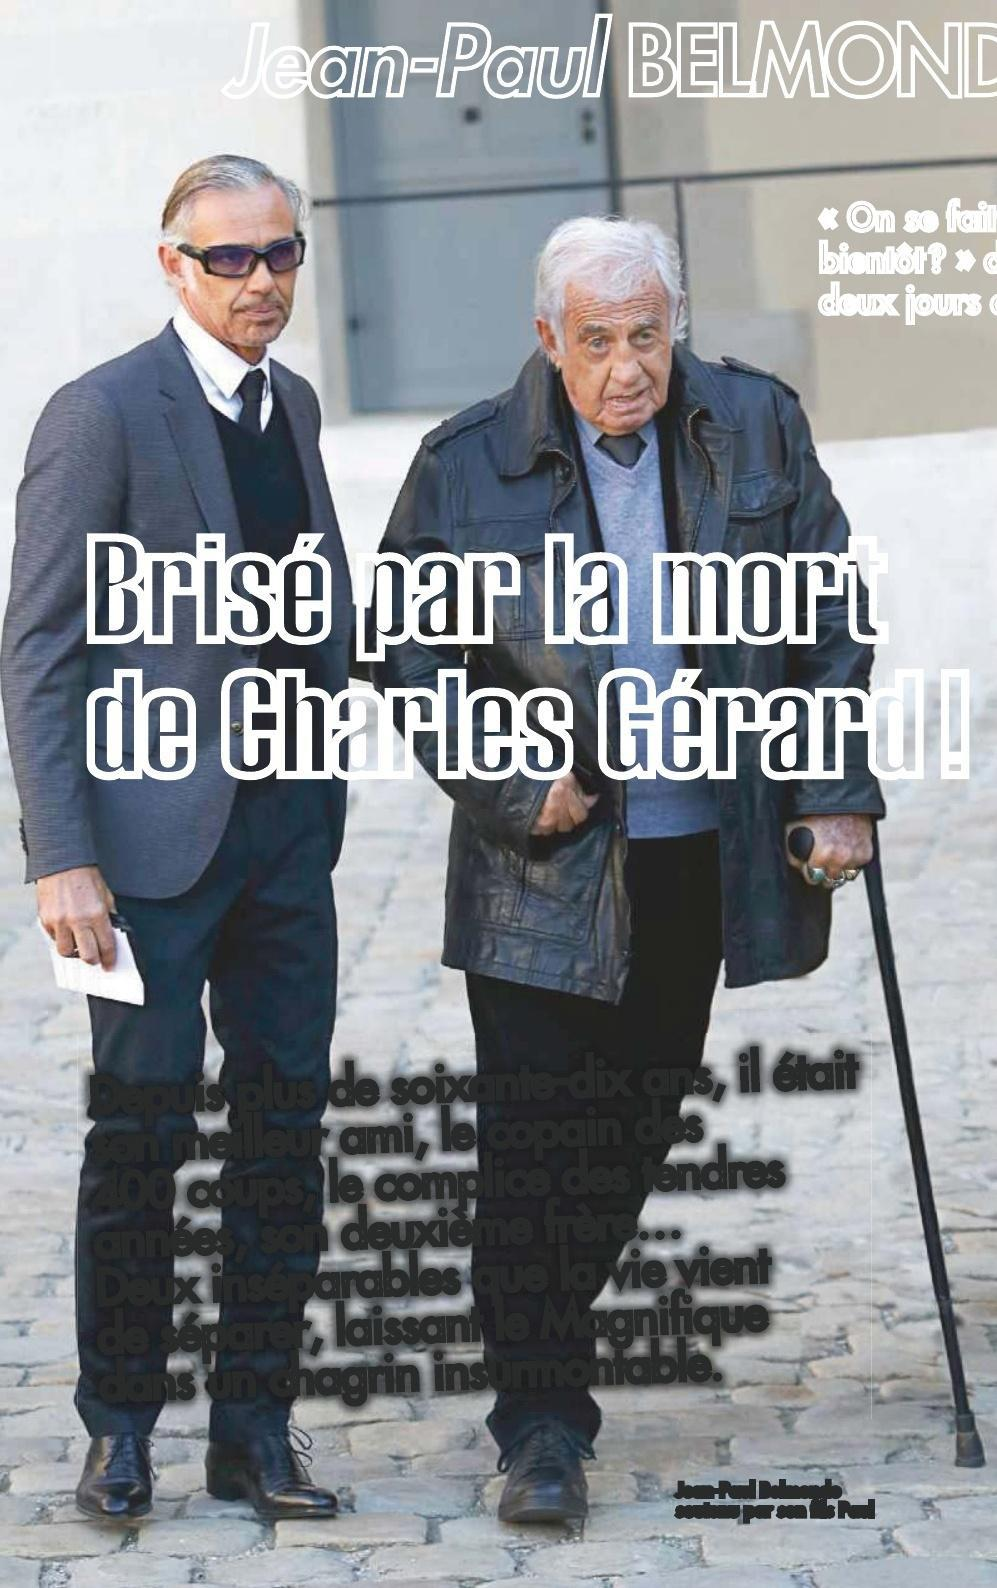 FRANÇOIS PERRET